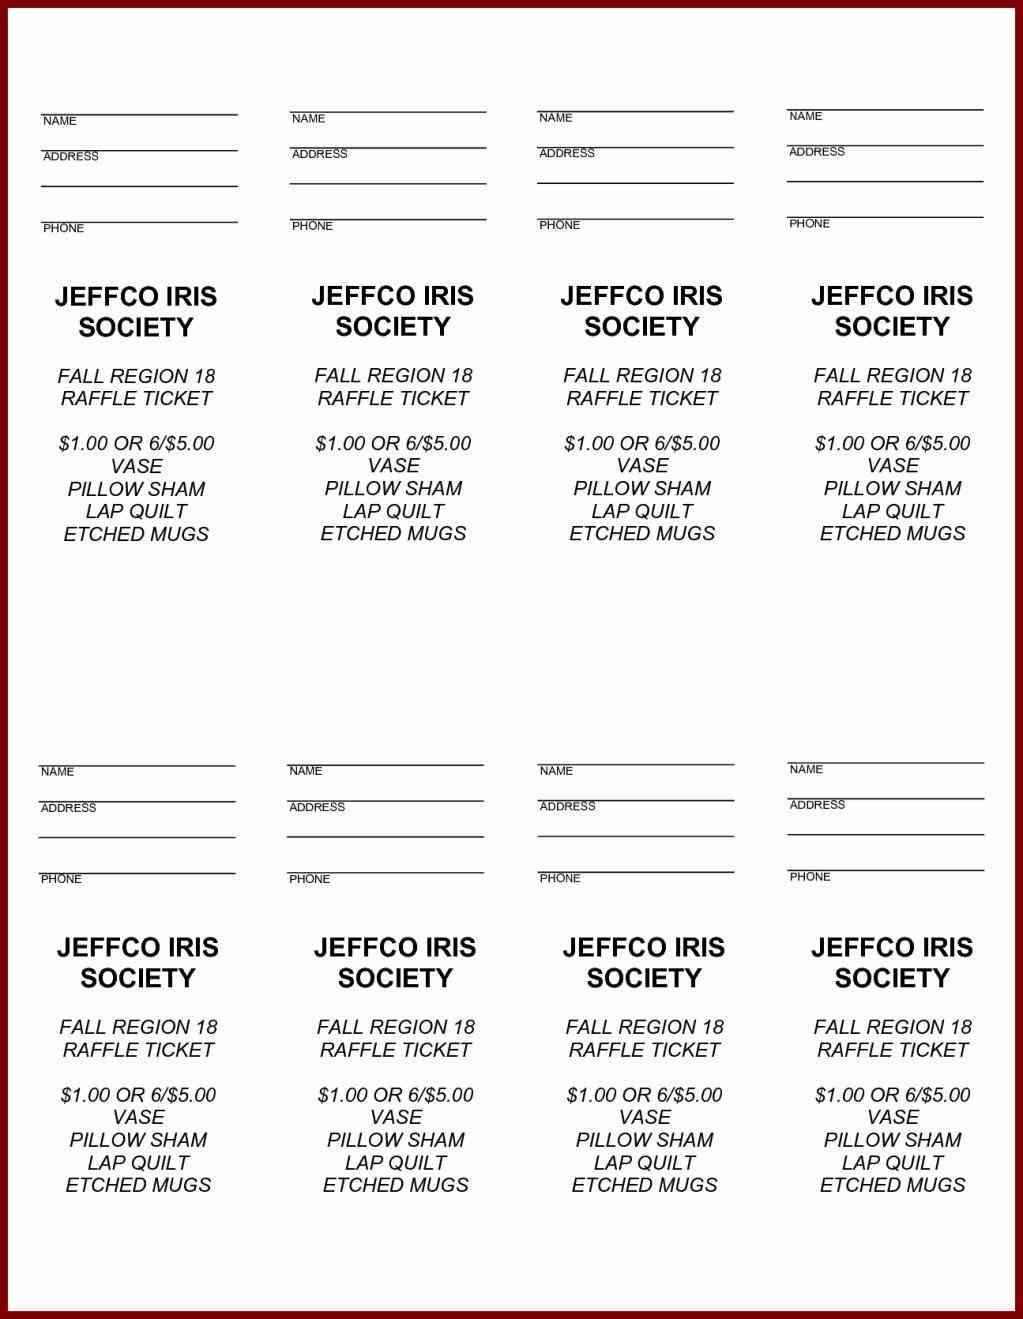 Free Printable Raffle Ticket Template Easytouse Free Raffle Ticket - Free Printable Raffle Ticket Template